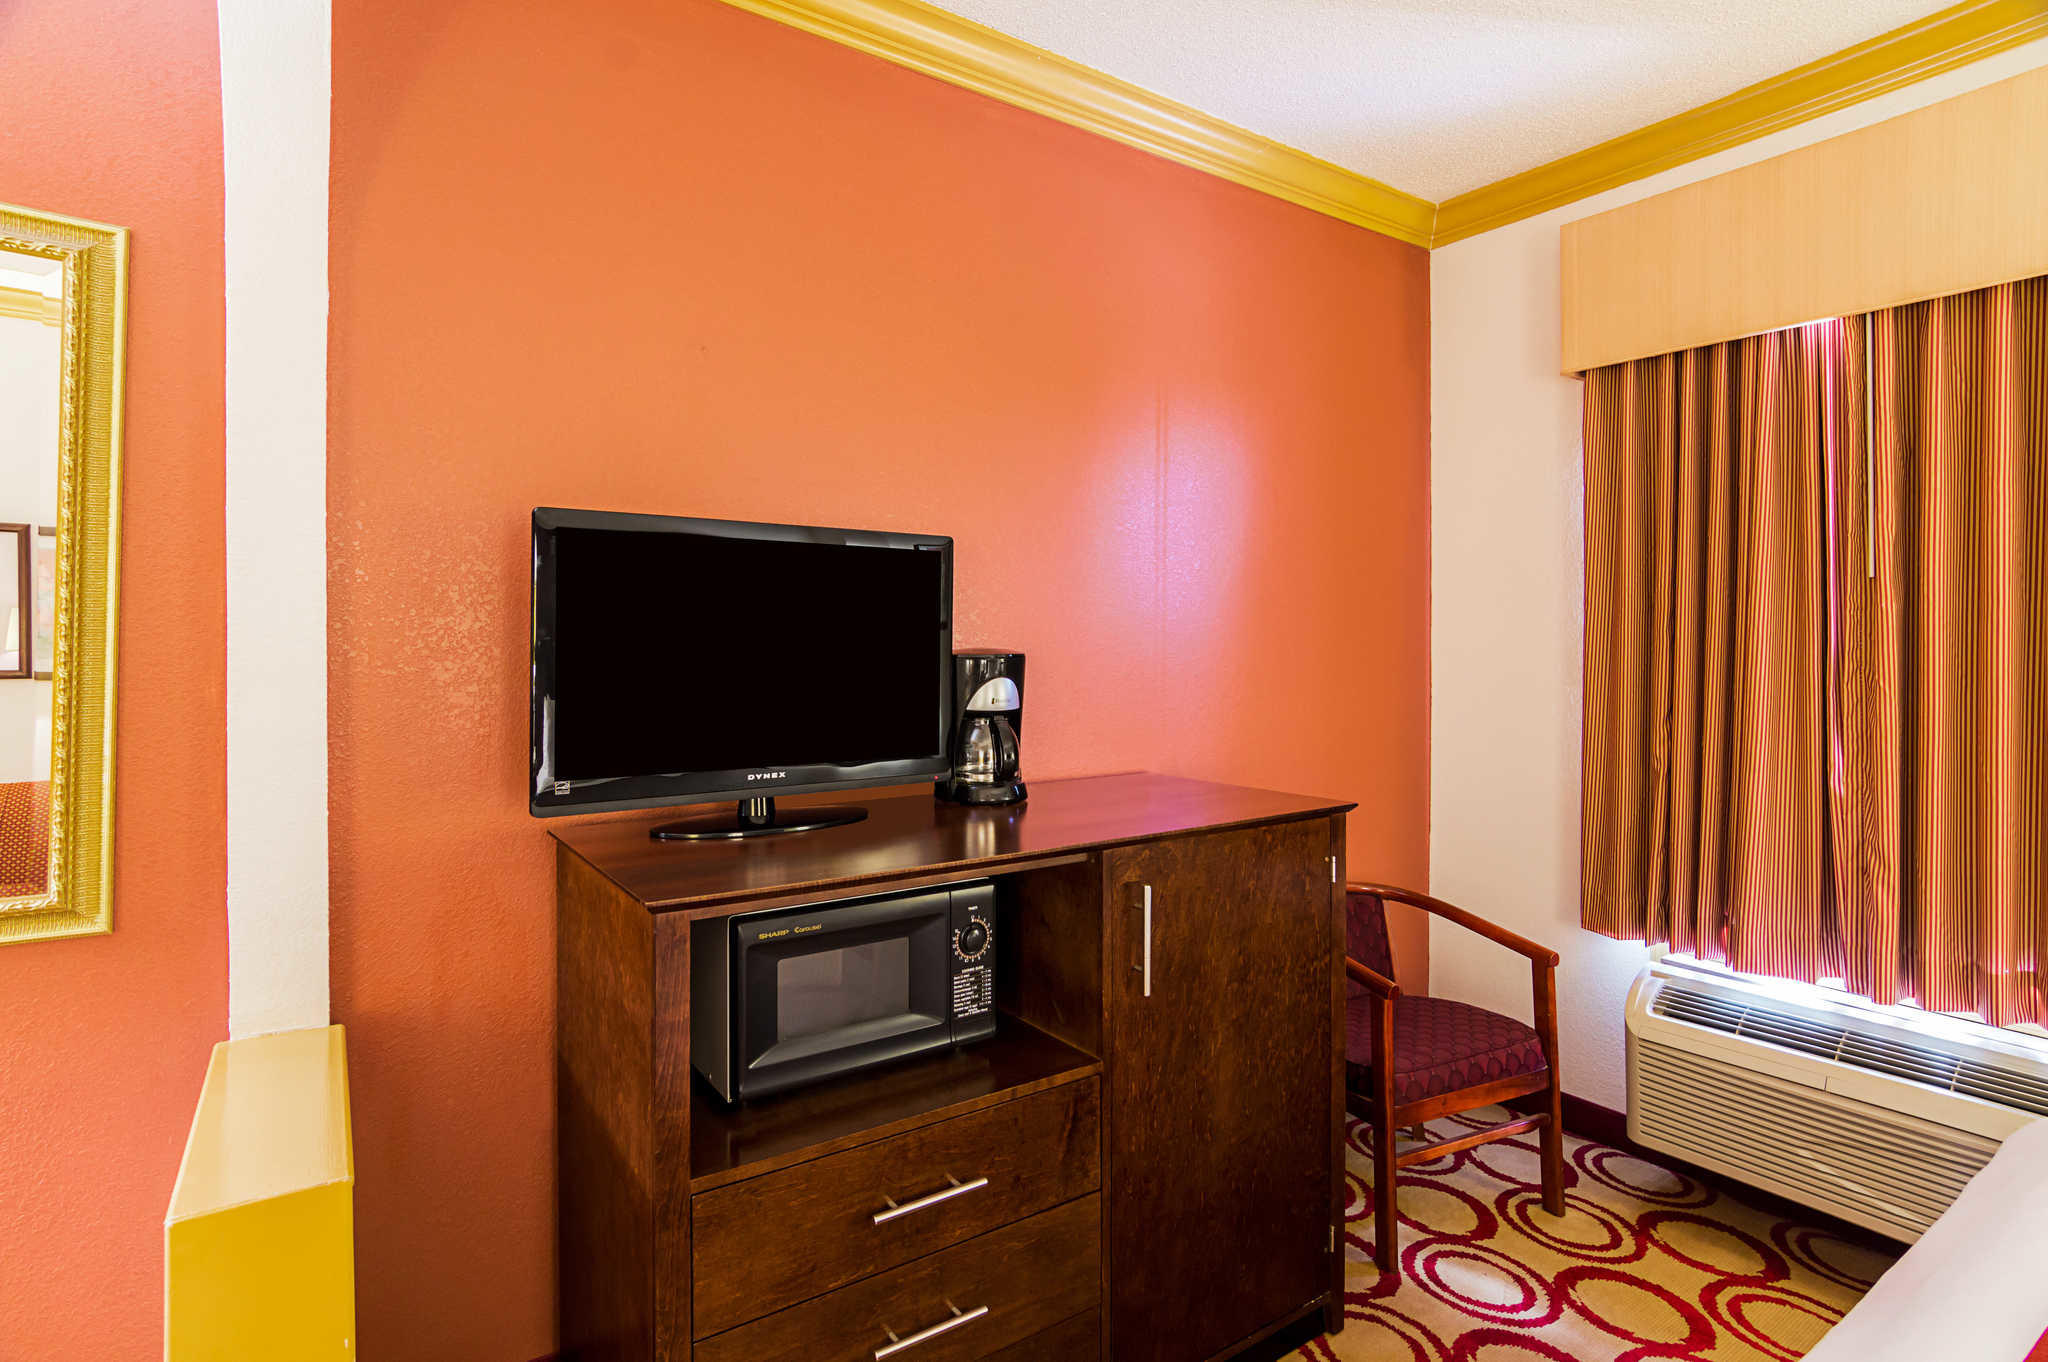 Comfort Suites image 32